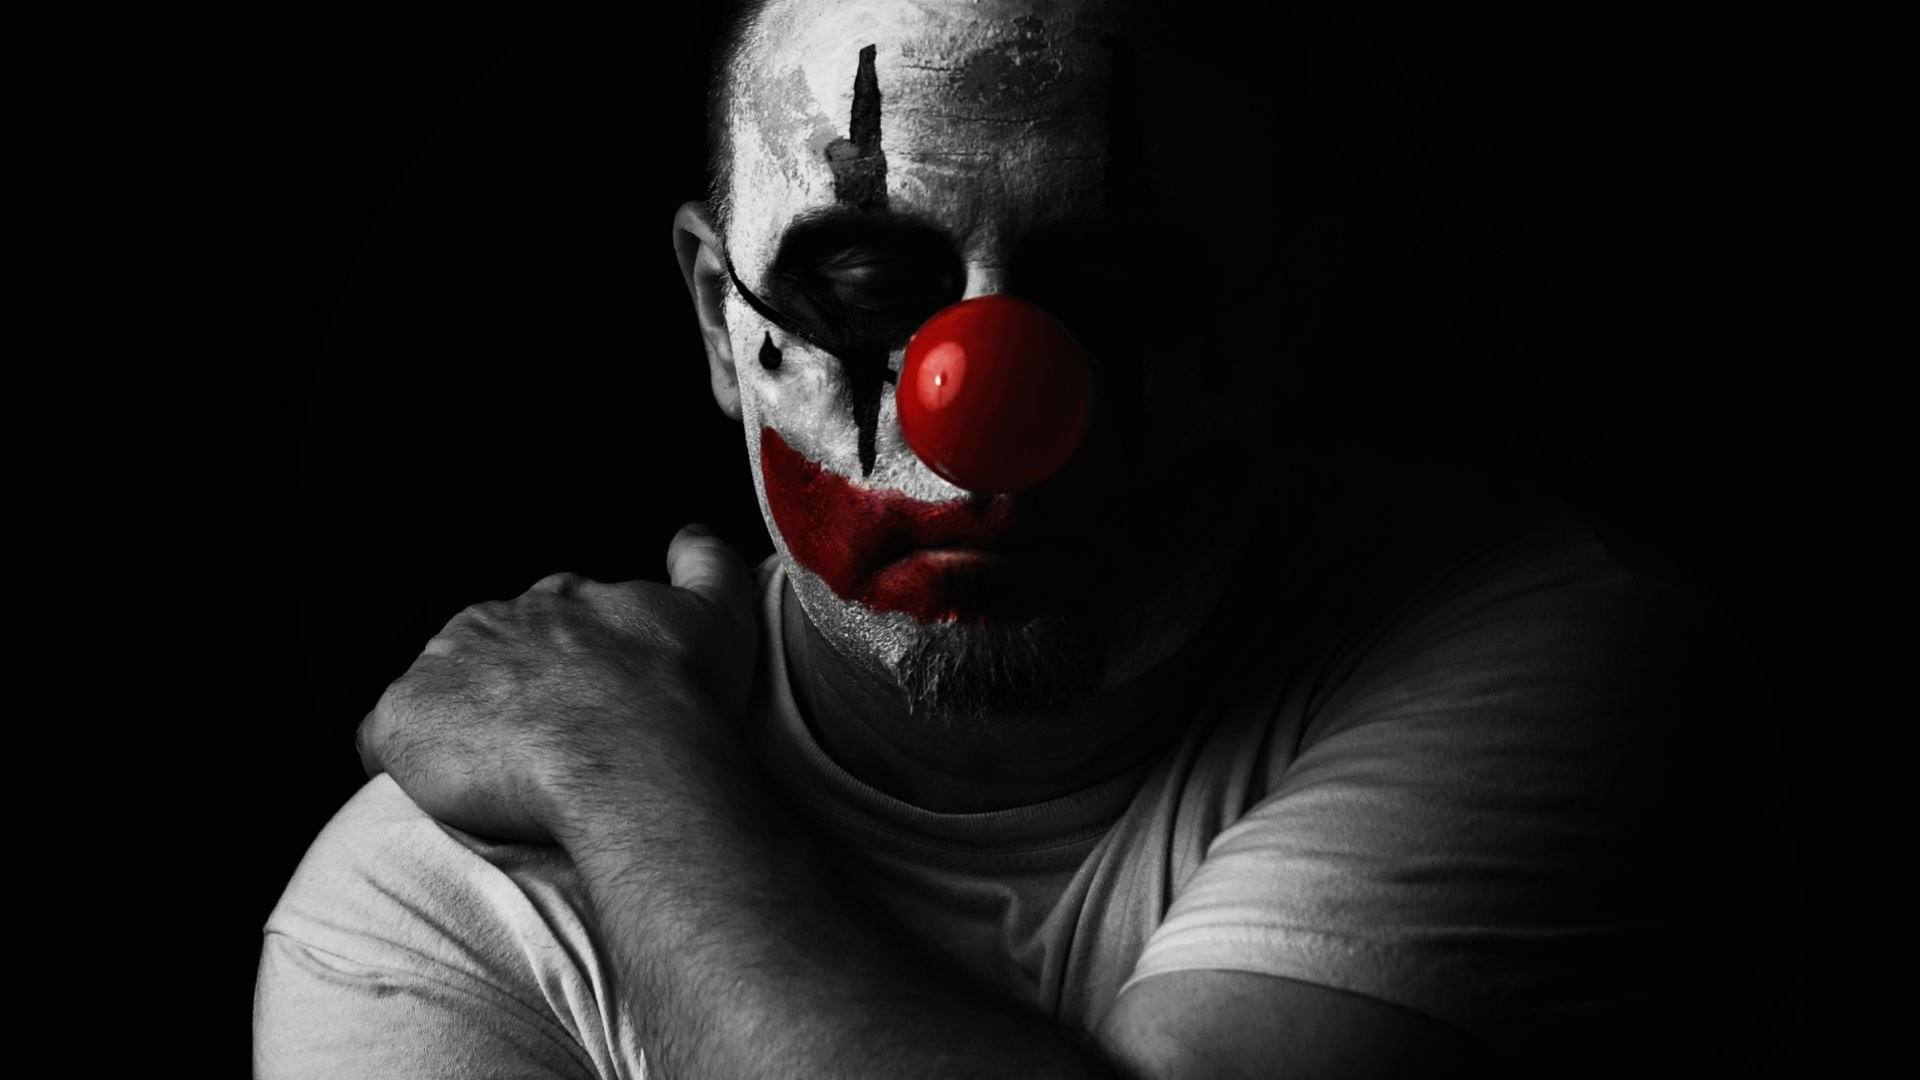 Evil Clown Wallpaper (63+ Images